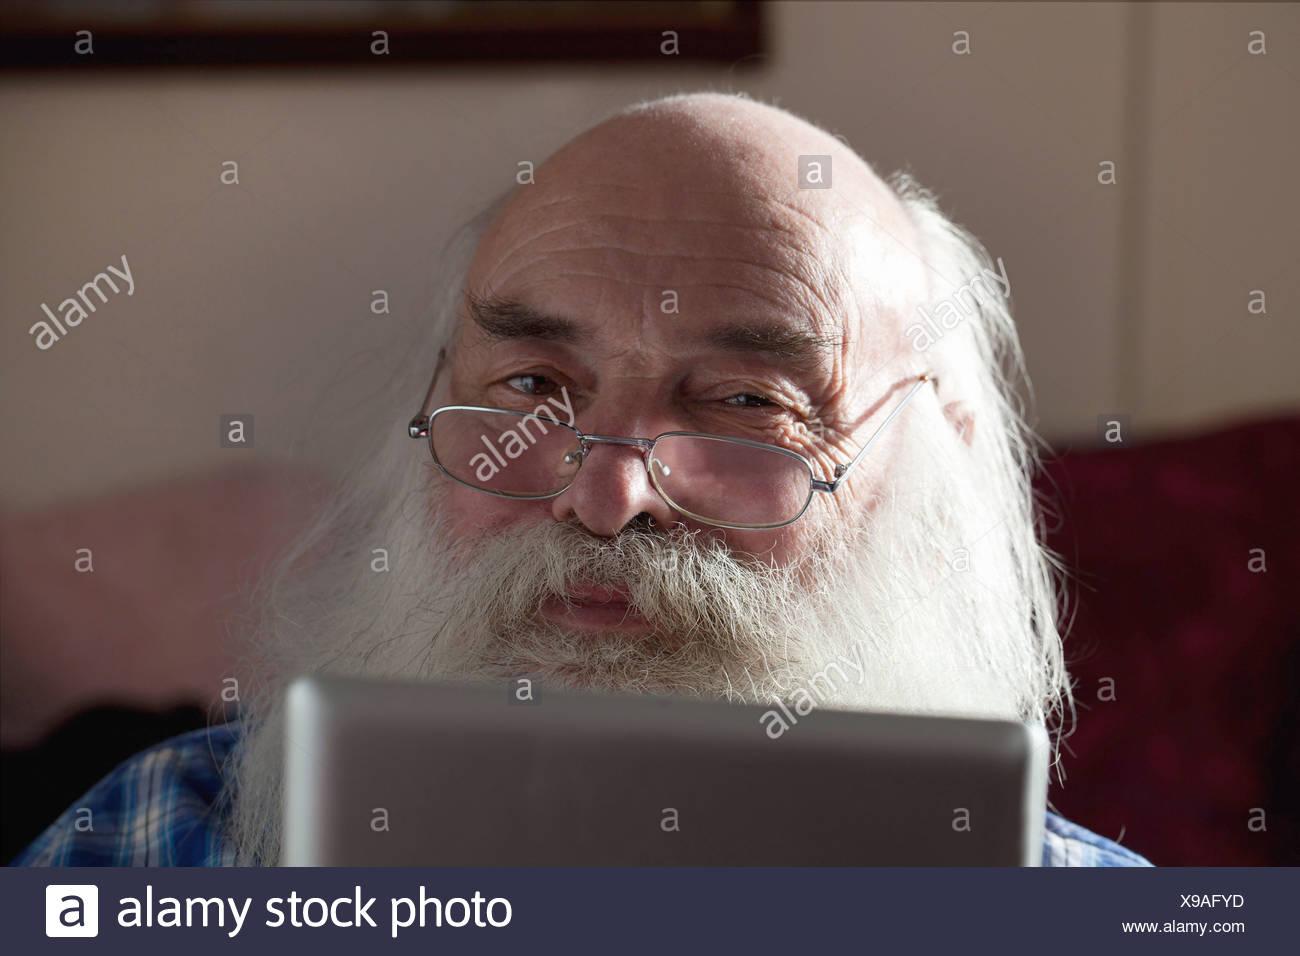 Senior man using digital tablet - Stock Image